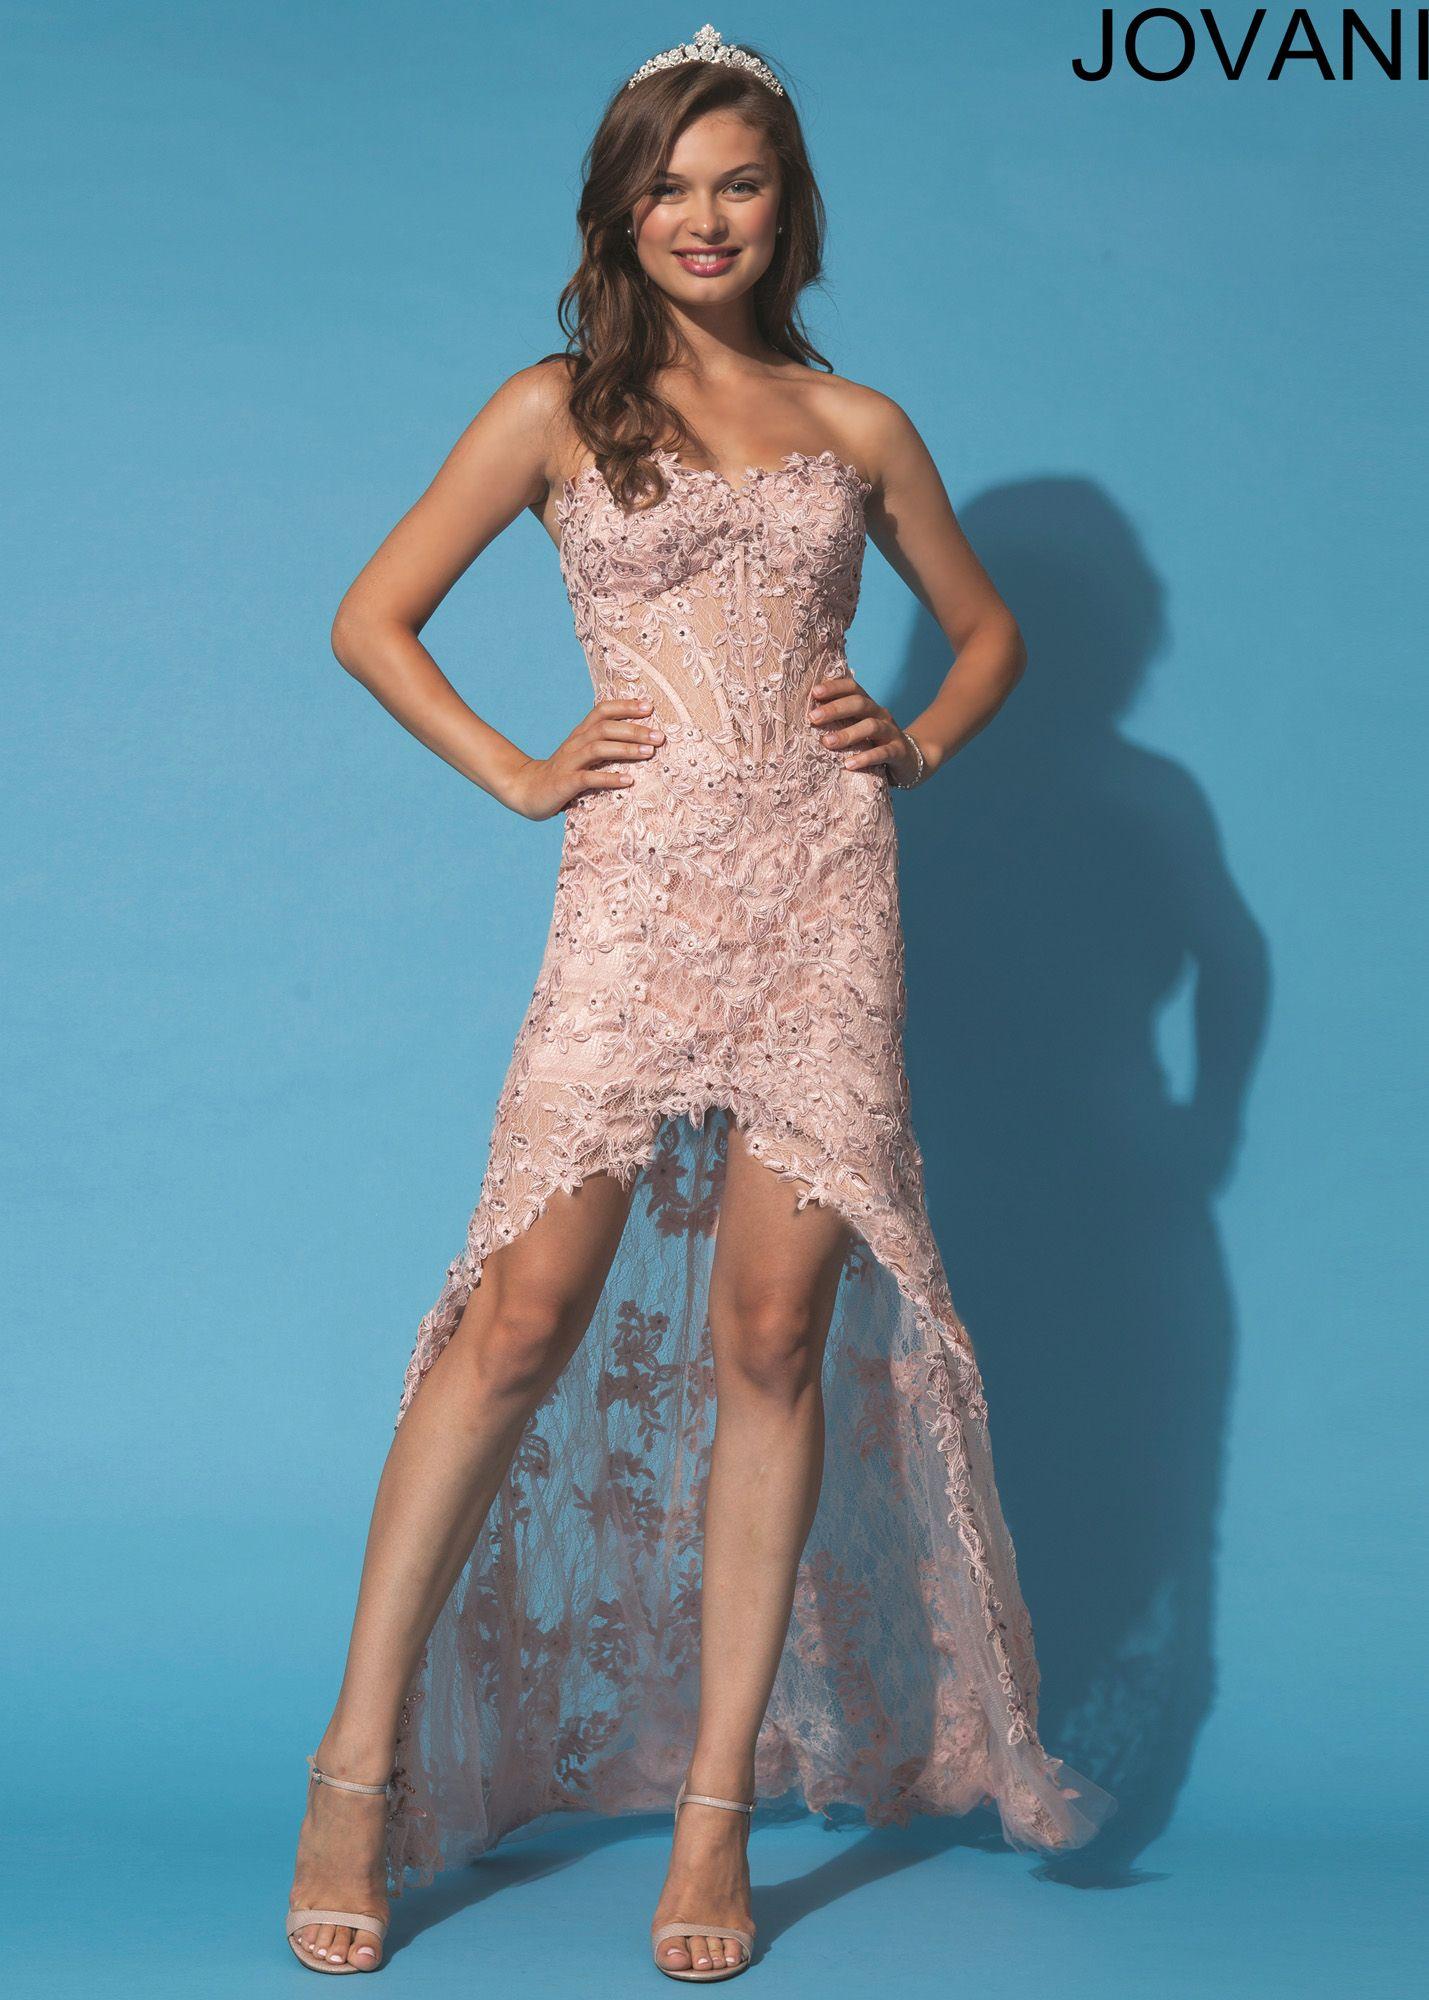 Jovani 92545 - Blush Strapless Lace High Low Prom Dresses Online ...